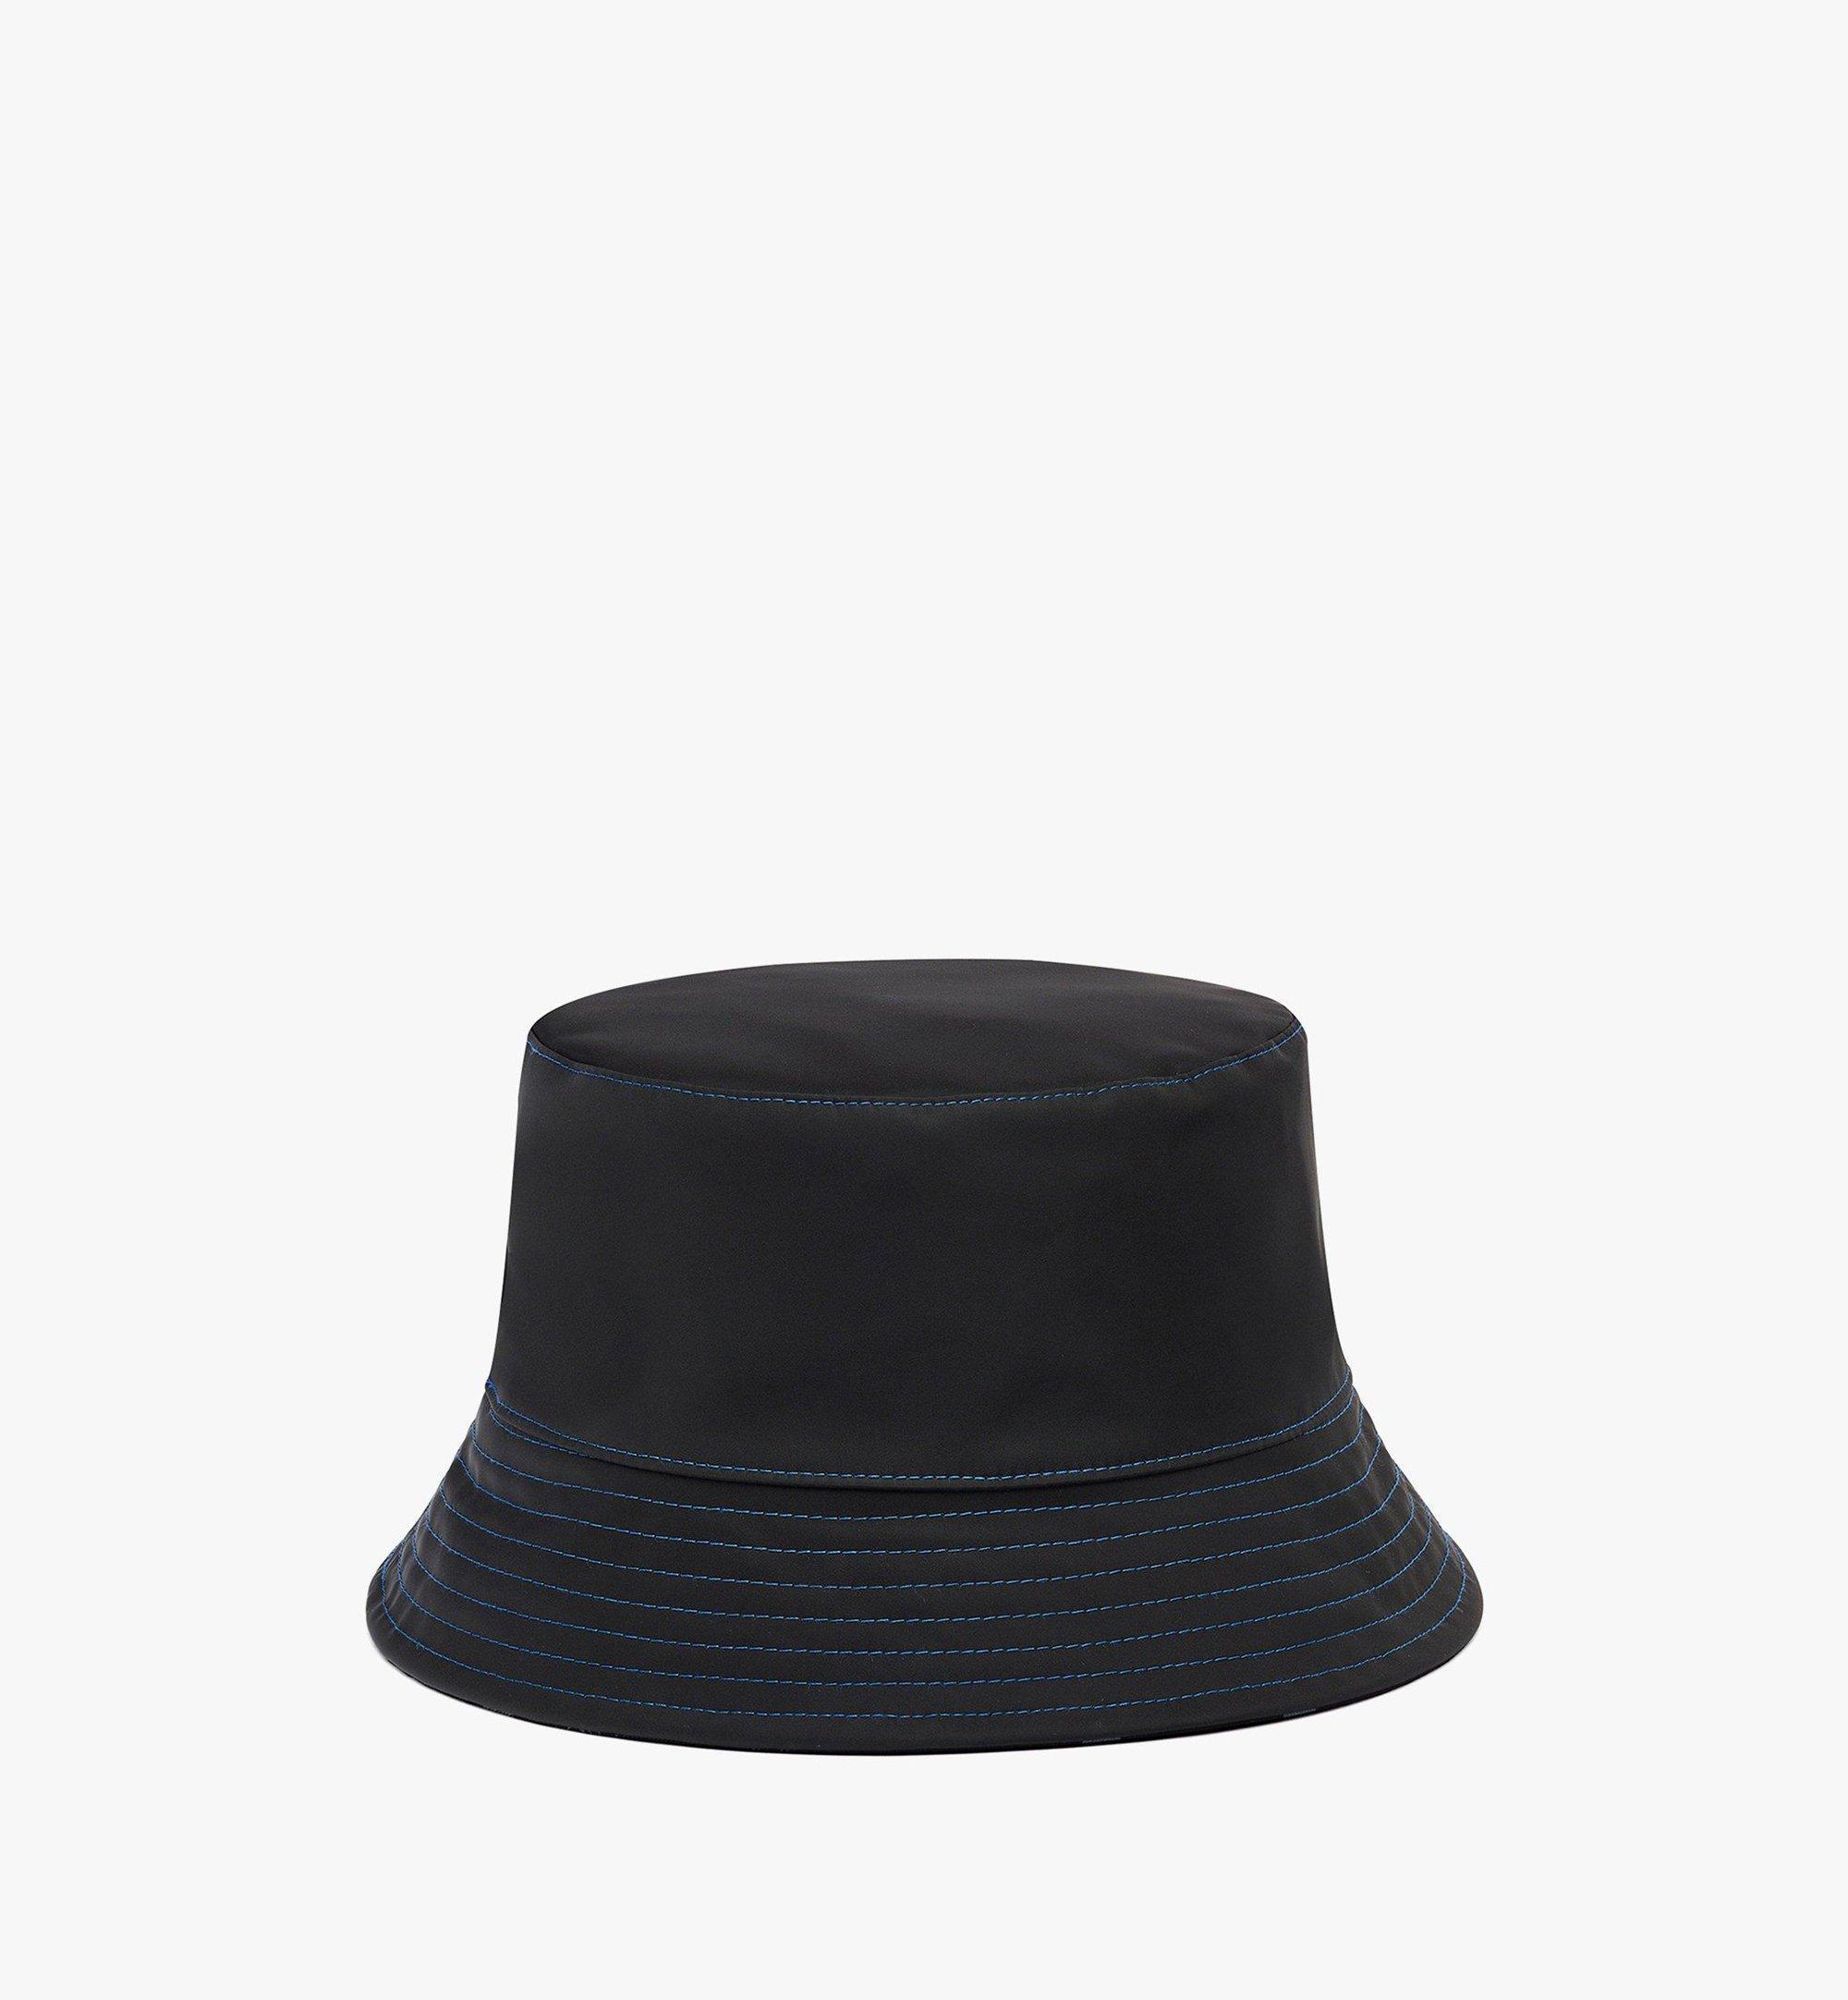 MCM MCM x SAMBYPEN Bucket Hat Black MEHBASP01BK001 Alternate View 1